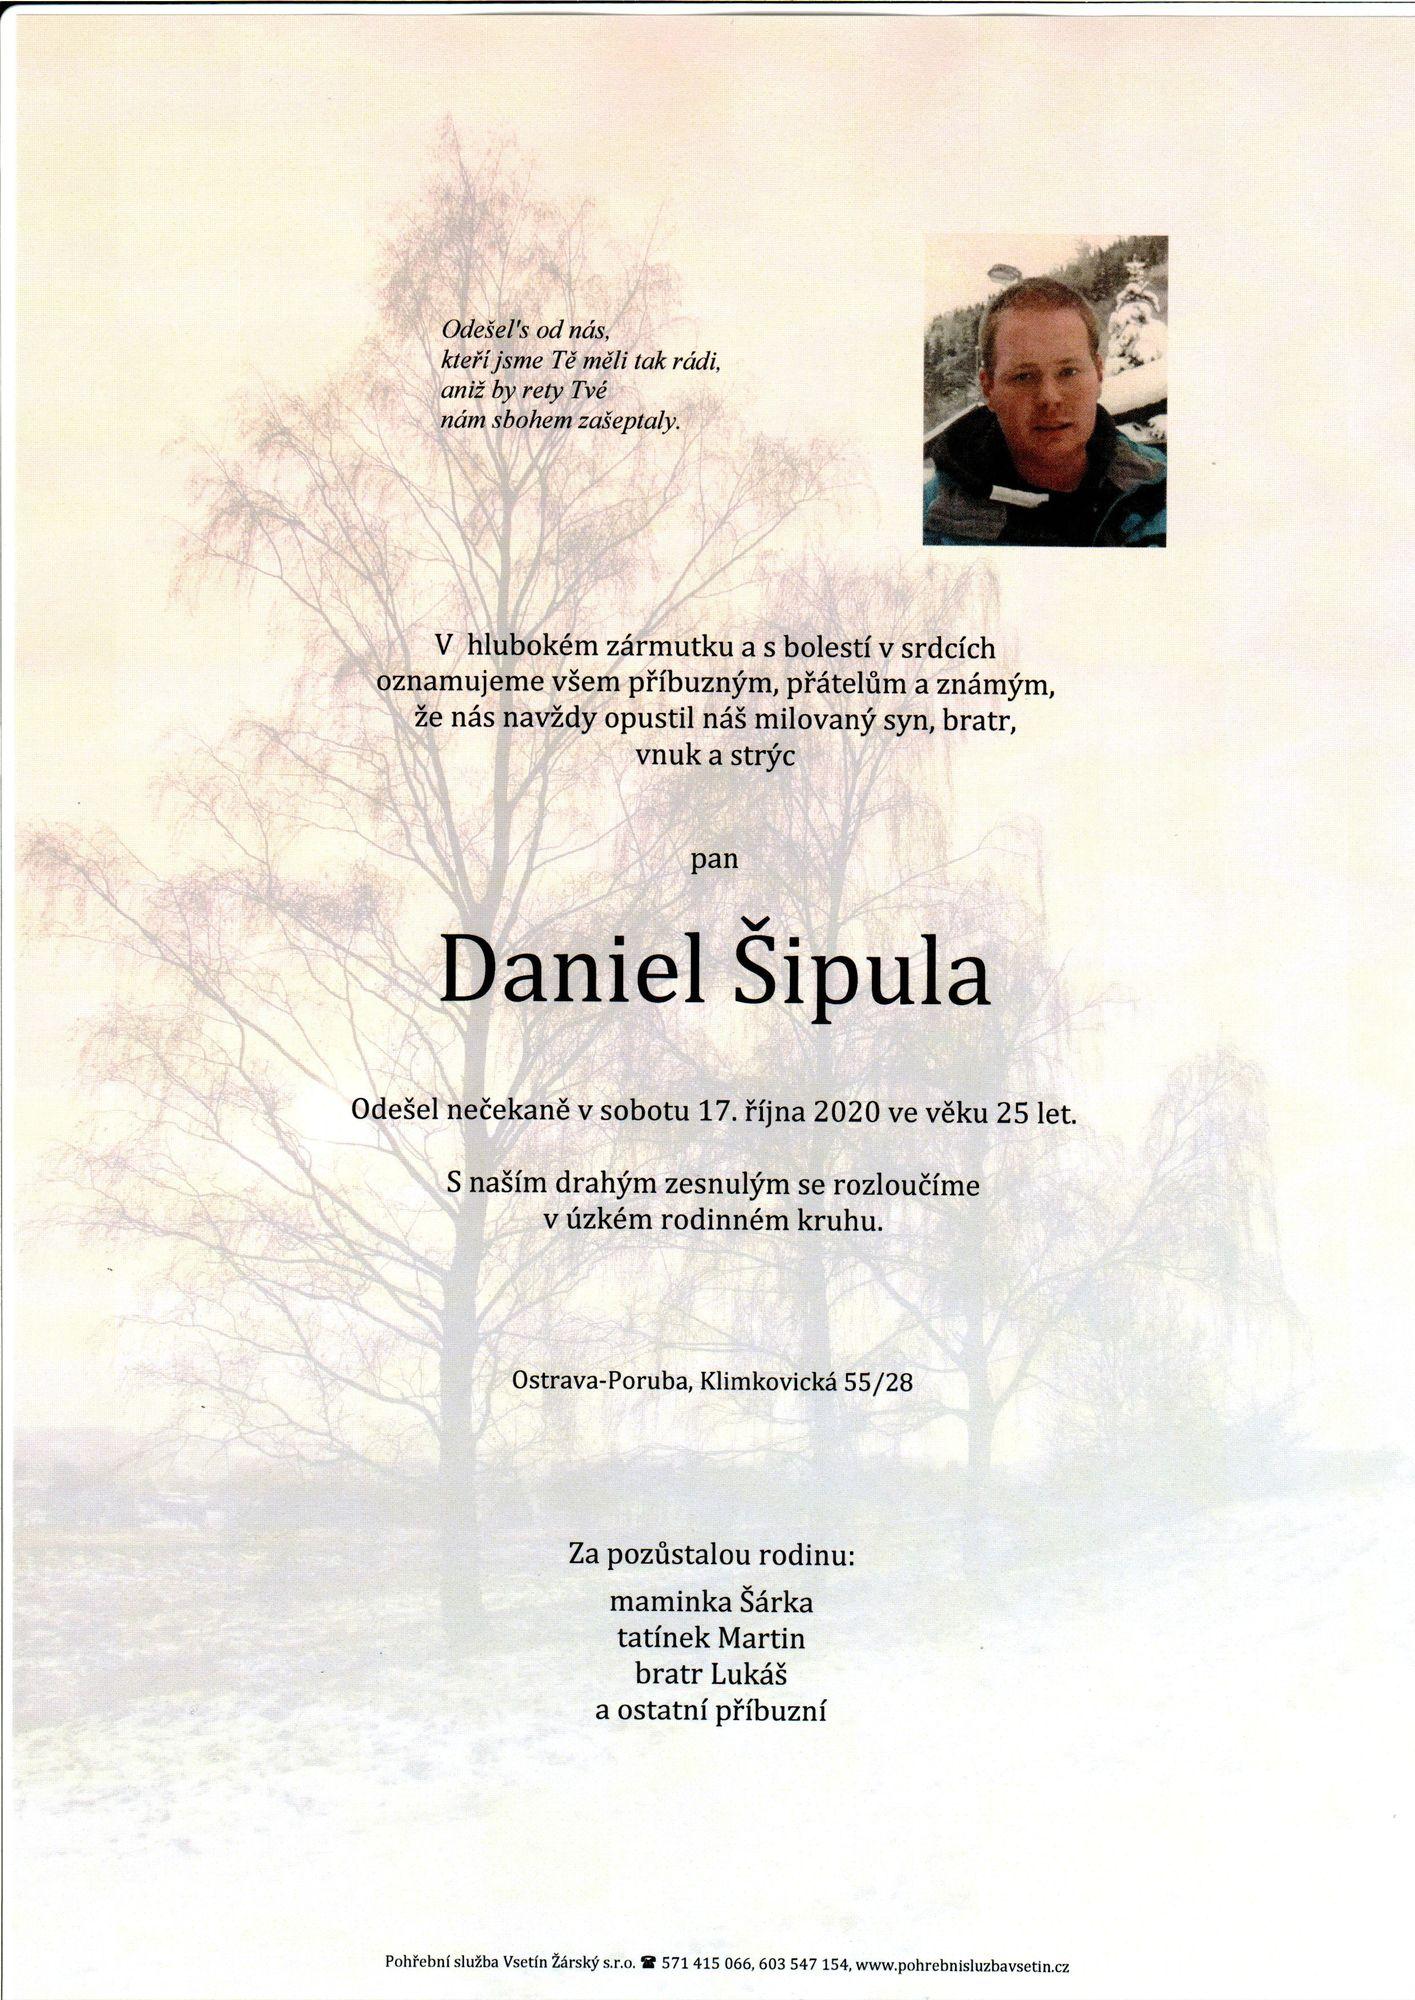 Daniel Šipula